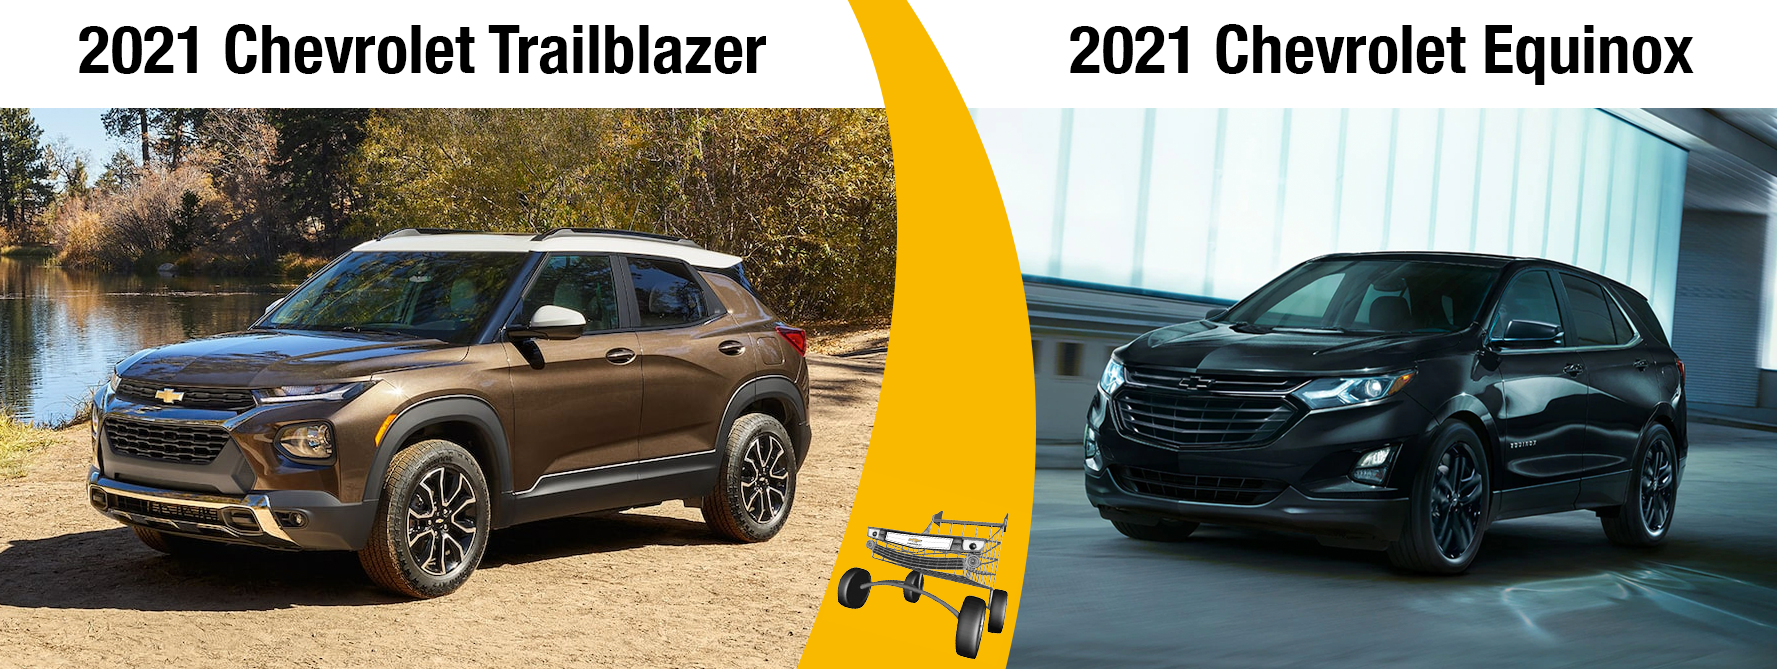 2021 Chevy Trailblazer vs 2021 Chevy Equinox Chicago IL